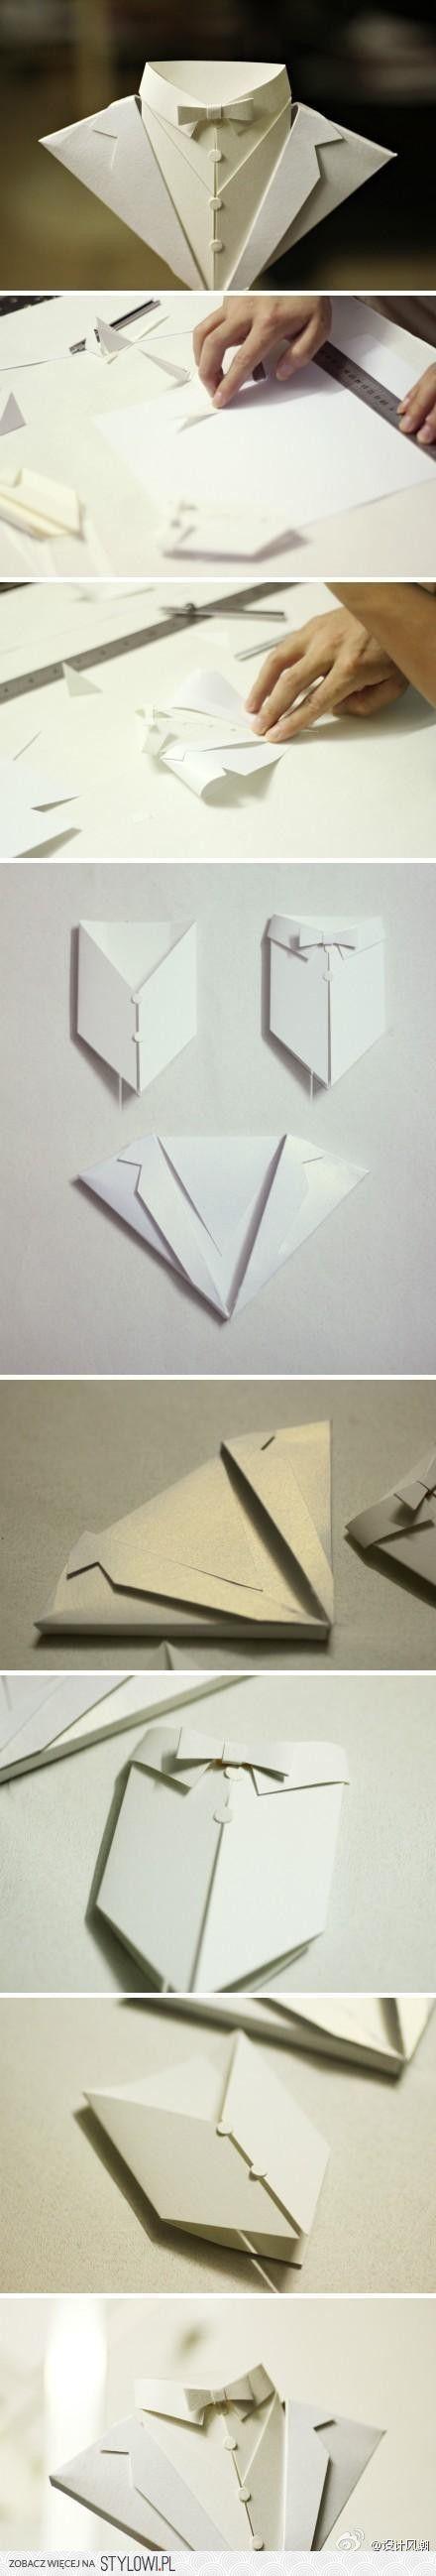 оригами сердце превращается в коробочку схема